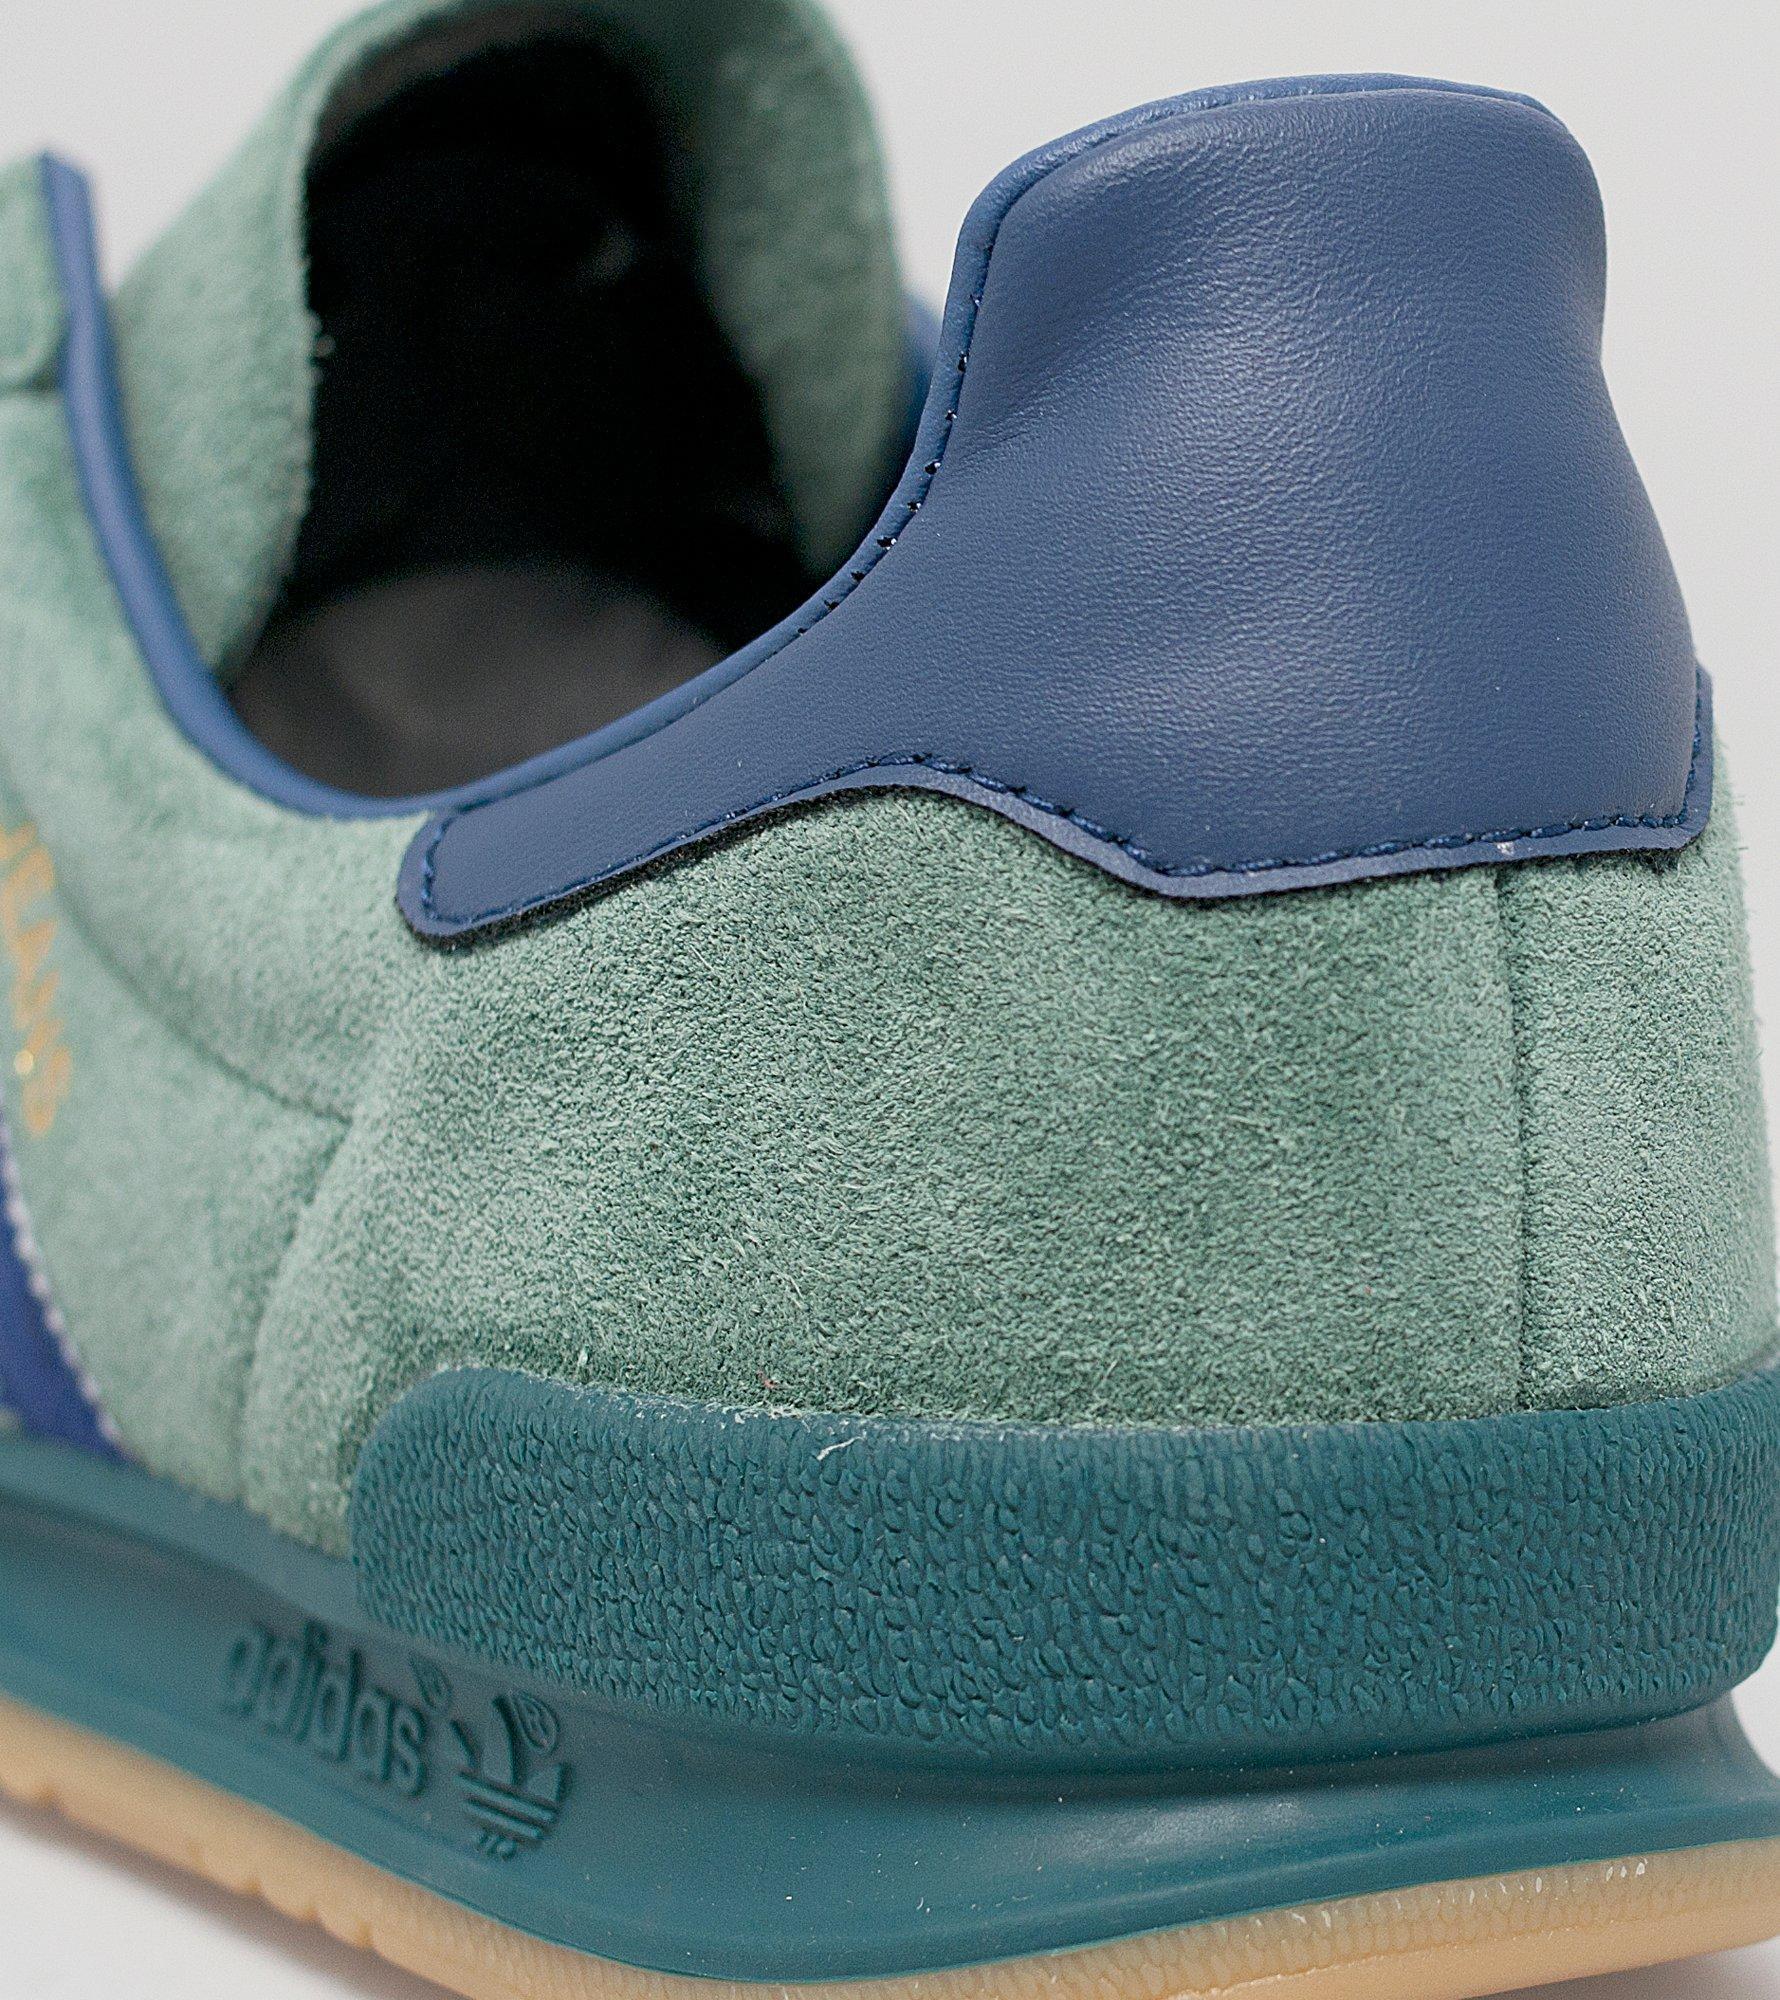 adidas jean 2